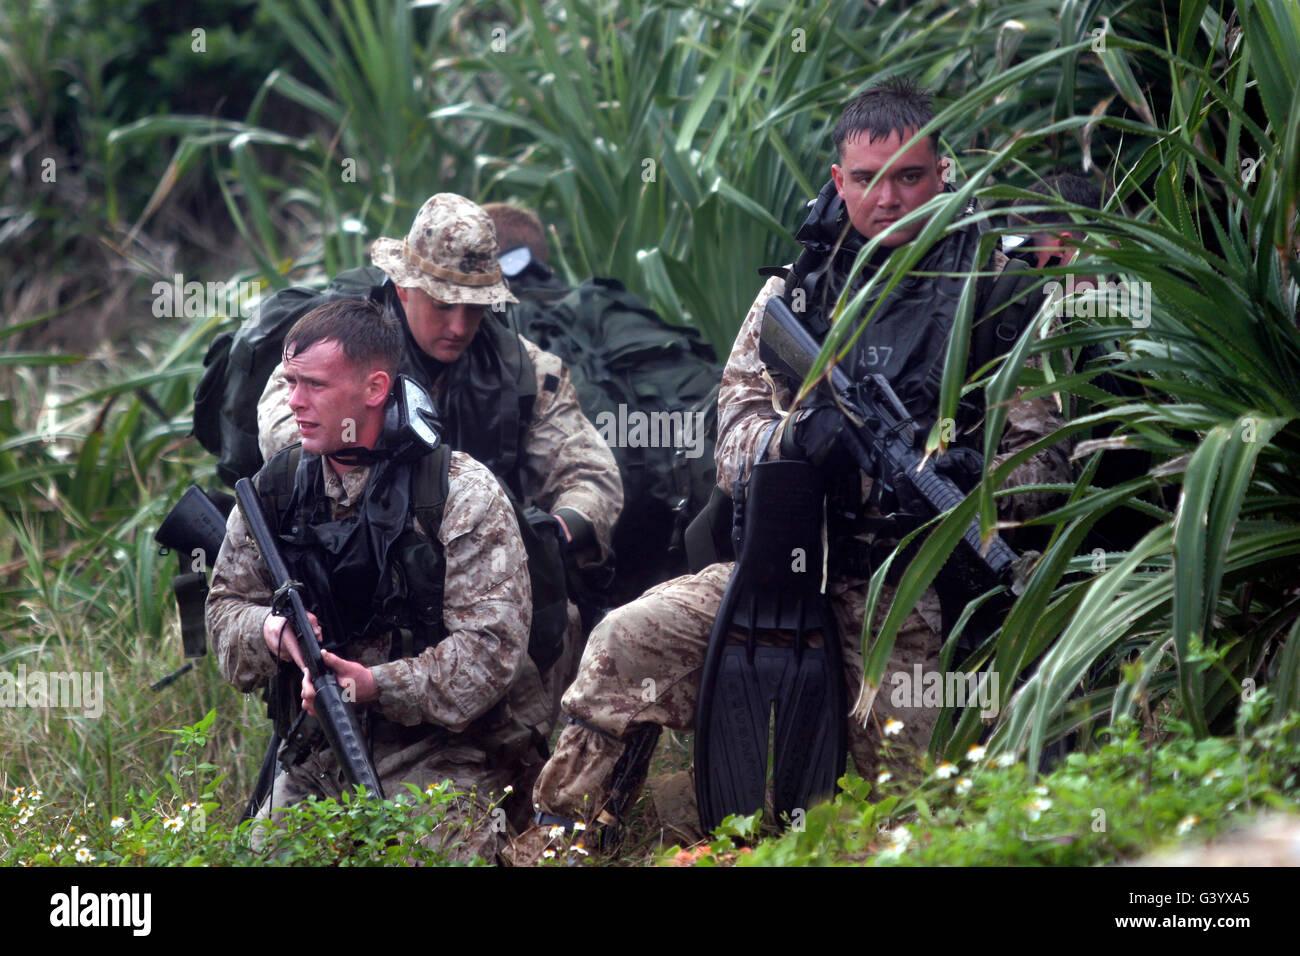 Reconnaissance men perform a gear check. - Stock Image